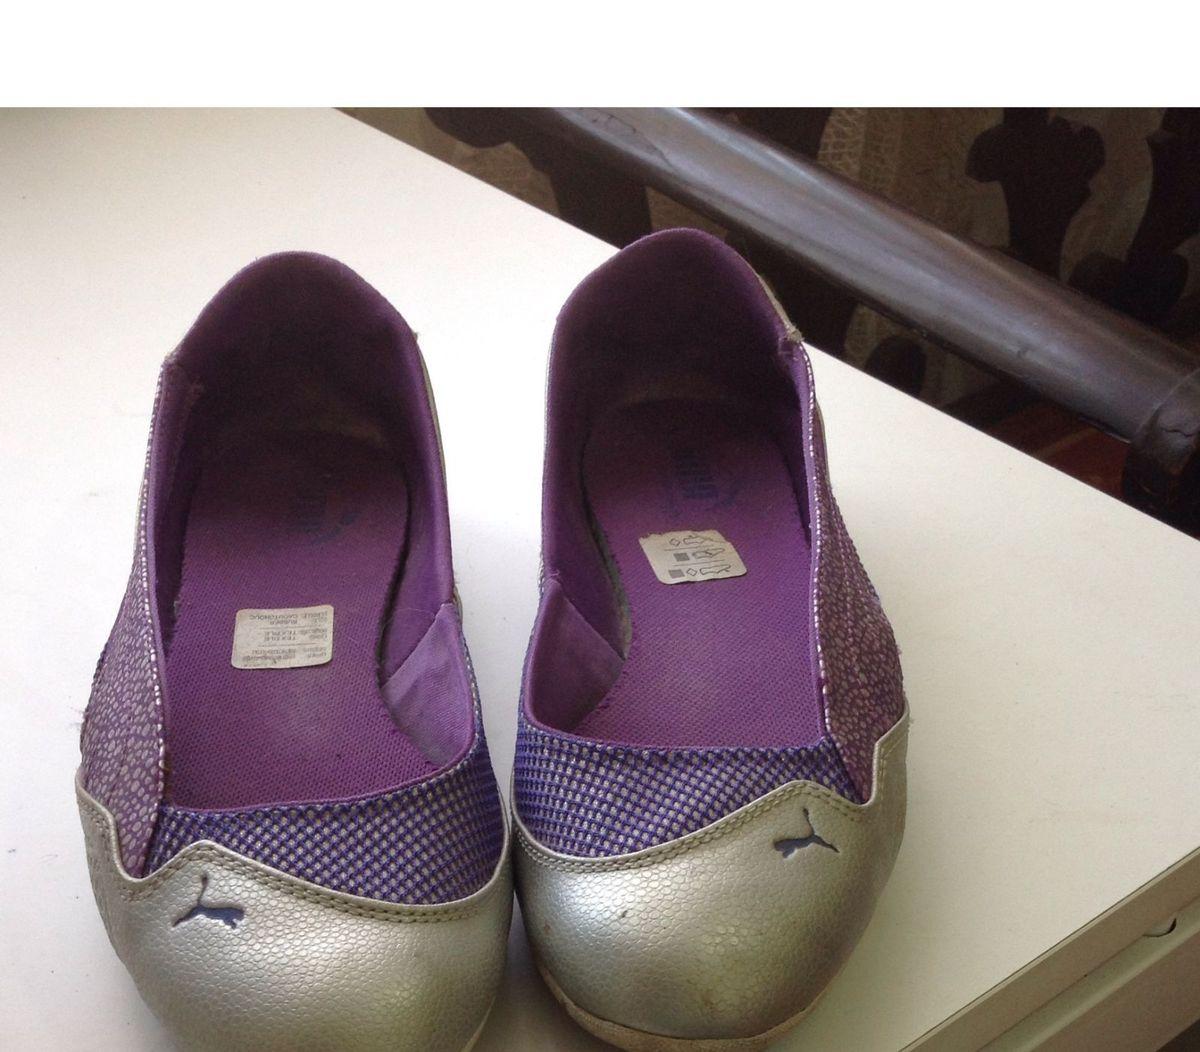 73b6d547141 sapatilha roxa e prata - sapatilha puma.  Czm6ly9wag90b3muzw5qb2vplmnvbs5ici9wcm9kdwn0cy8zndc4odivowm5yzqymzfimgrmowqzota3ngjhytfizta2mjhjntyuanbn  ...